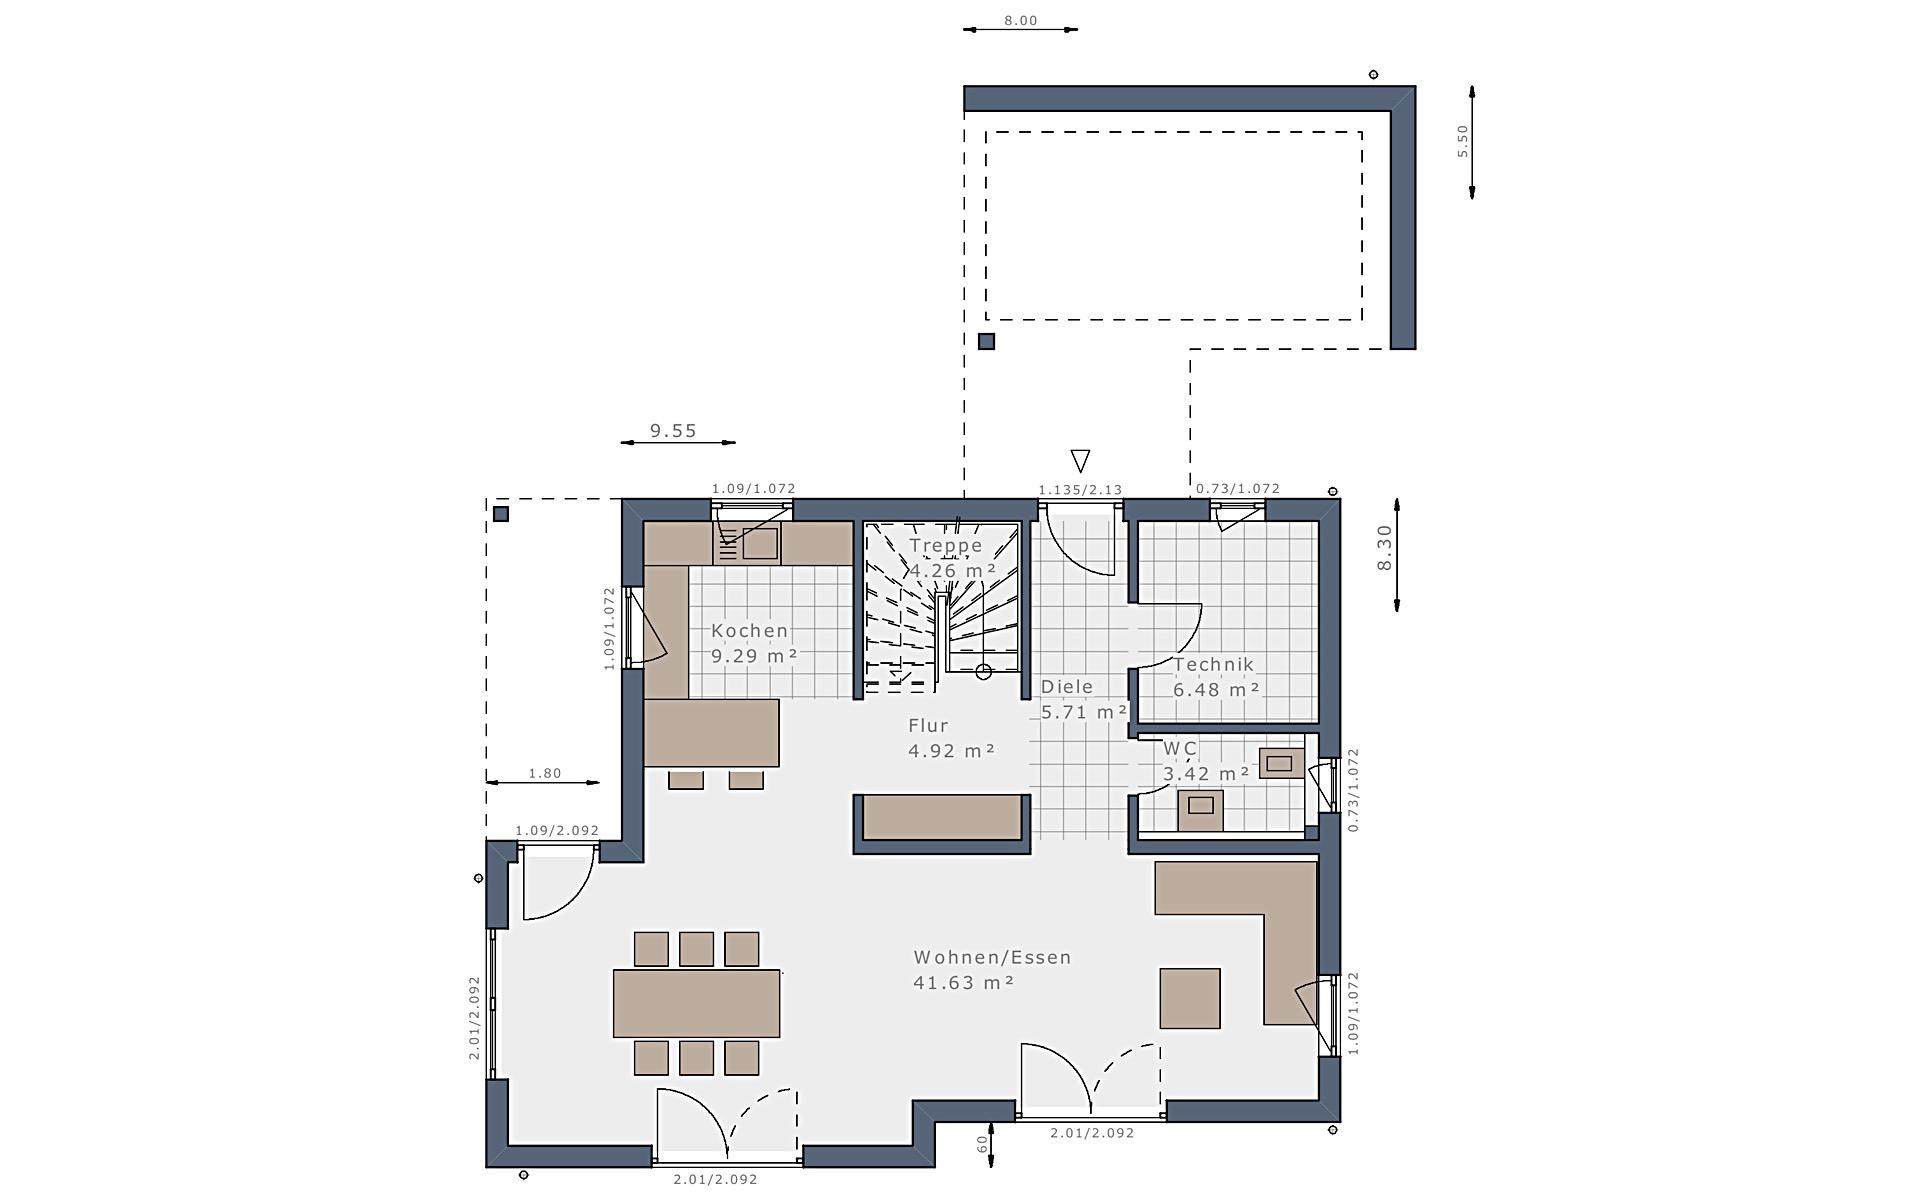 Erdgeschoss Sensation-E-132 E6 von Schwabenhaus GmbH & Co. KG